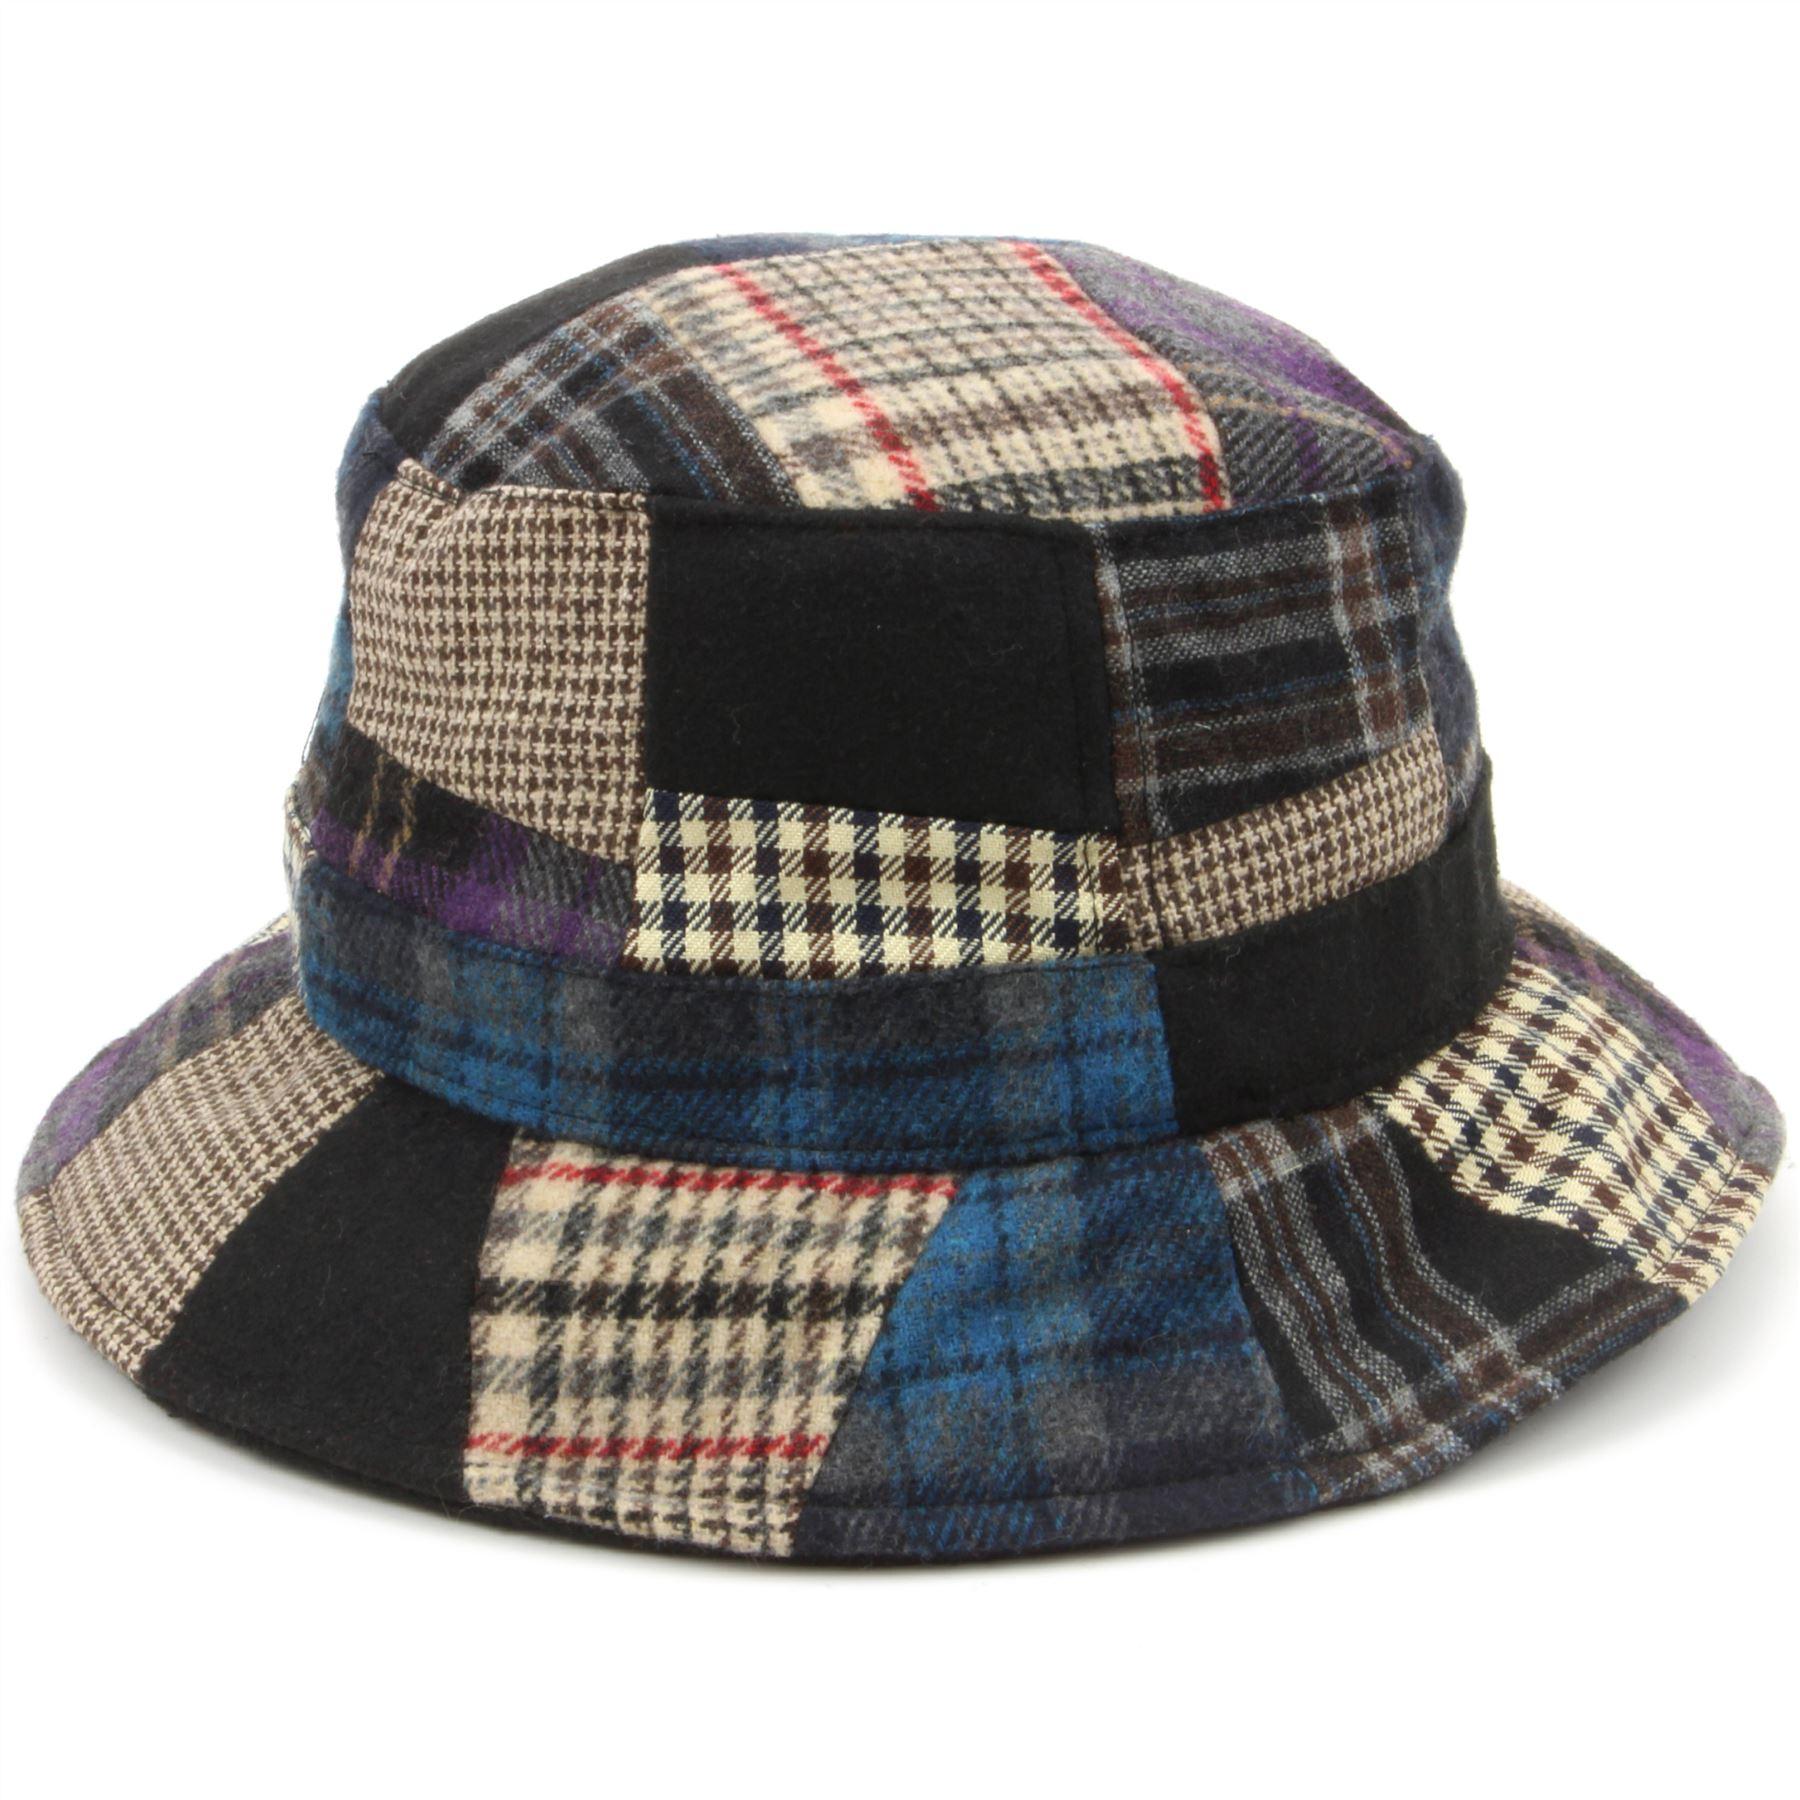 34246fbe049ba Details about Tweed Bucket Hat Hawkins Patchwork Wool BLUE RED 4 Sizes  Fisherman Cap